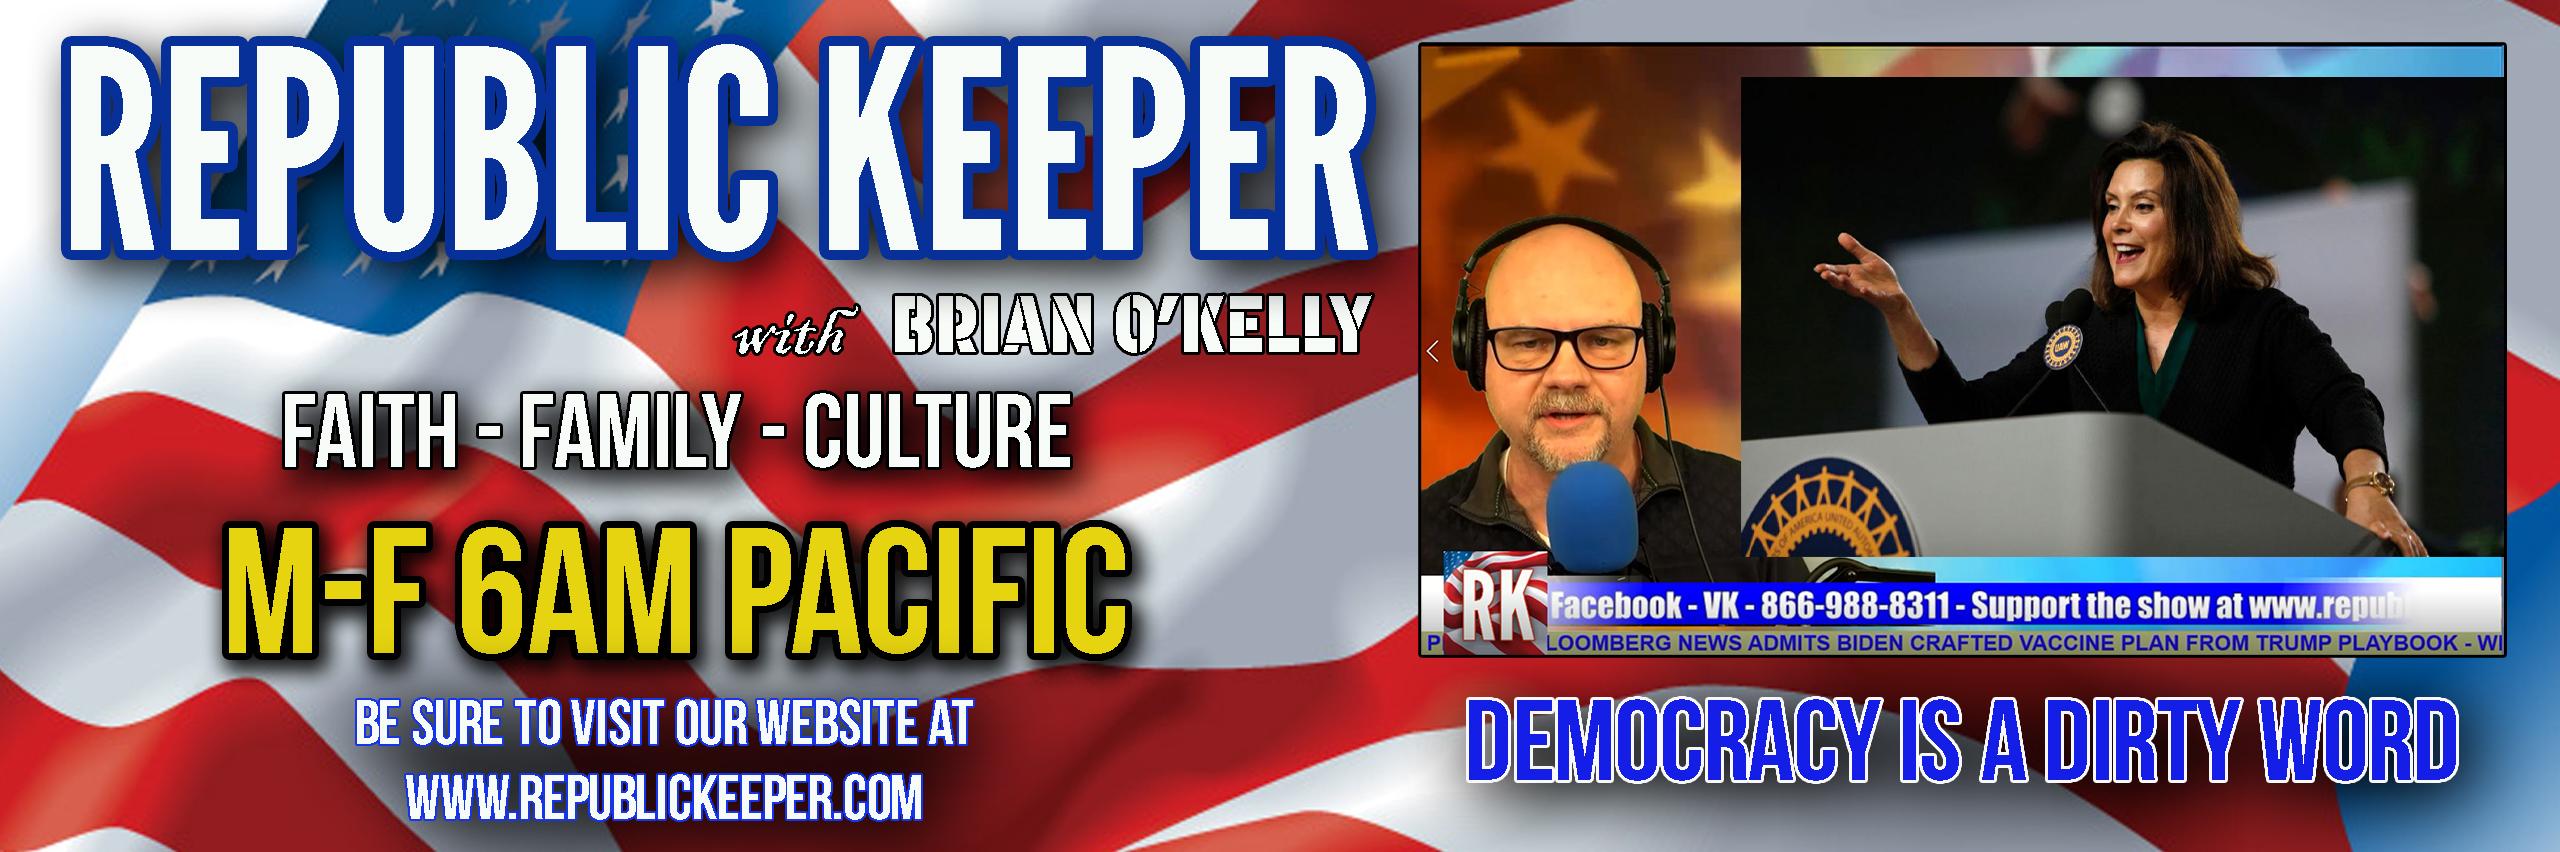 Republic_Keeper-header02